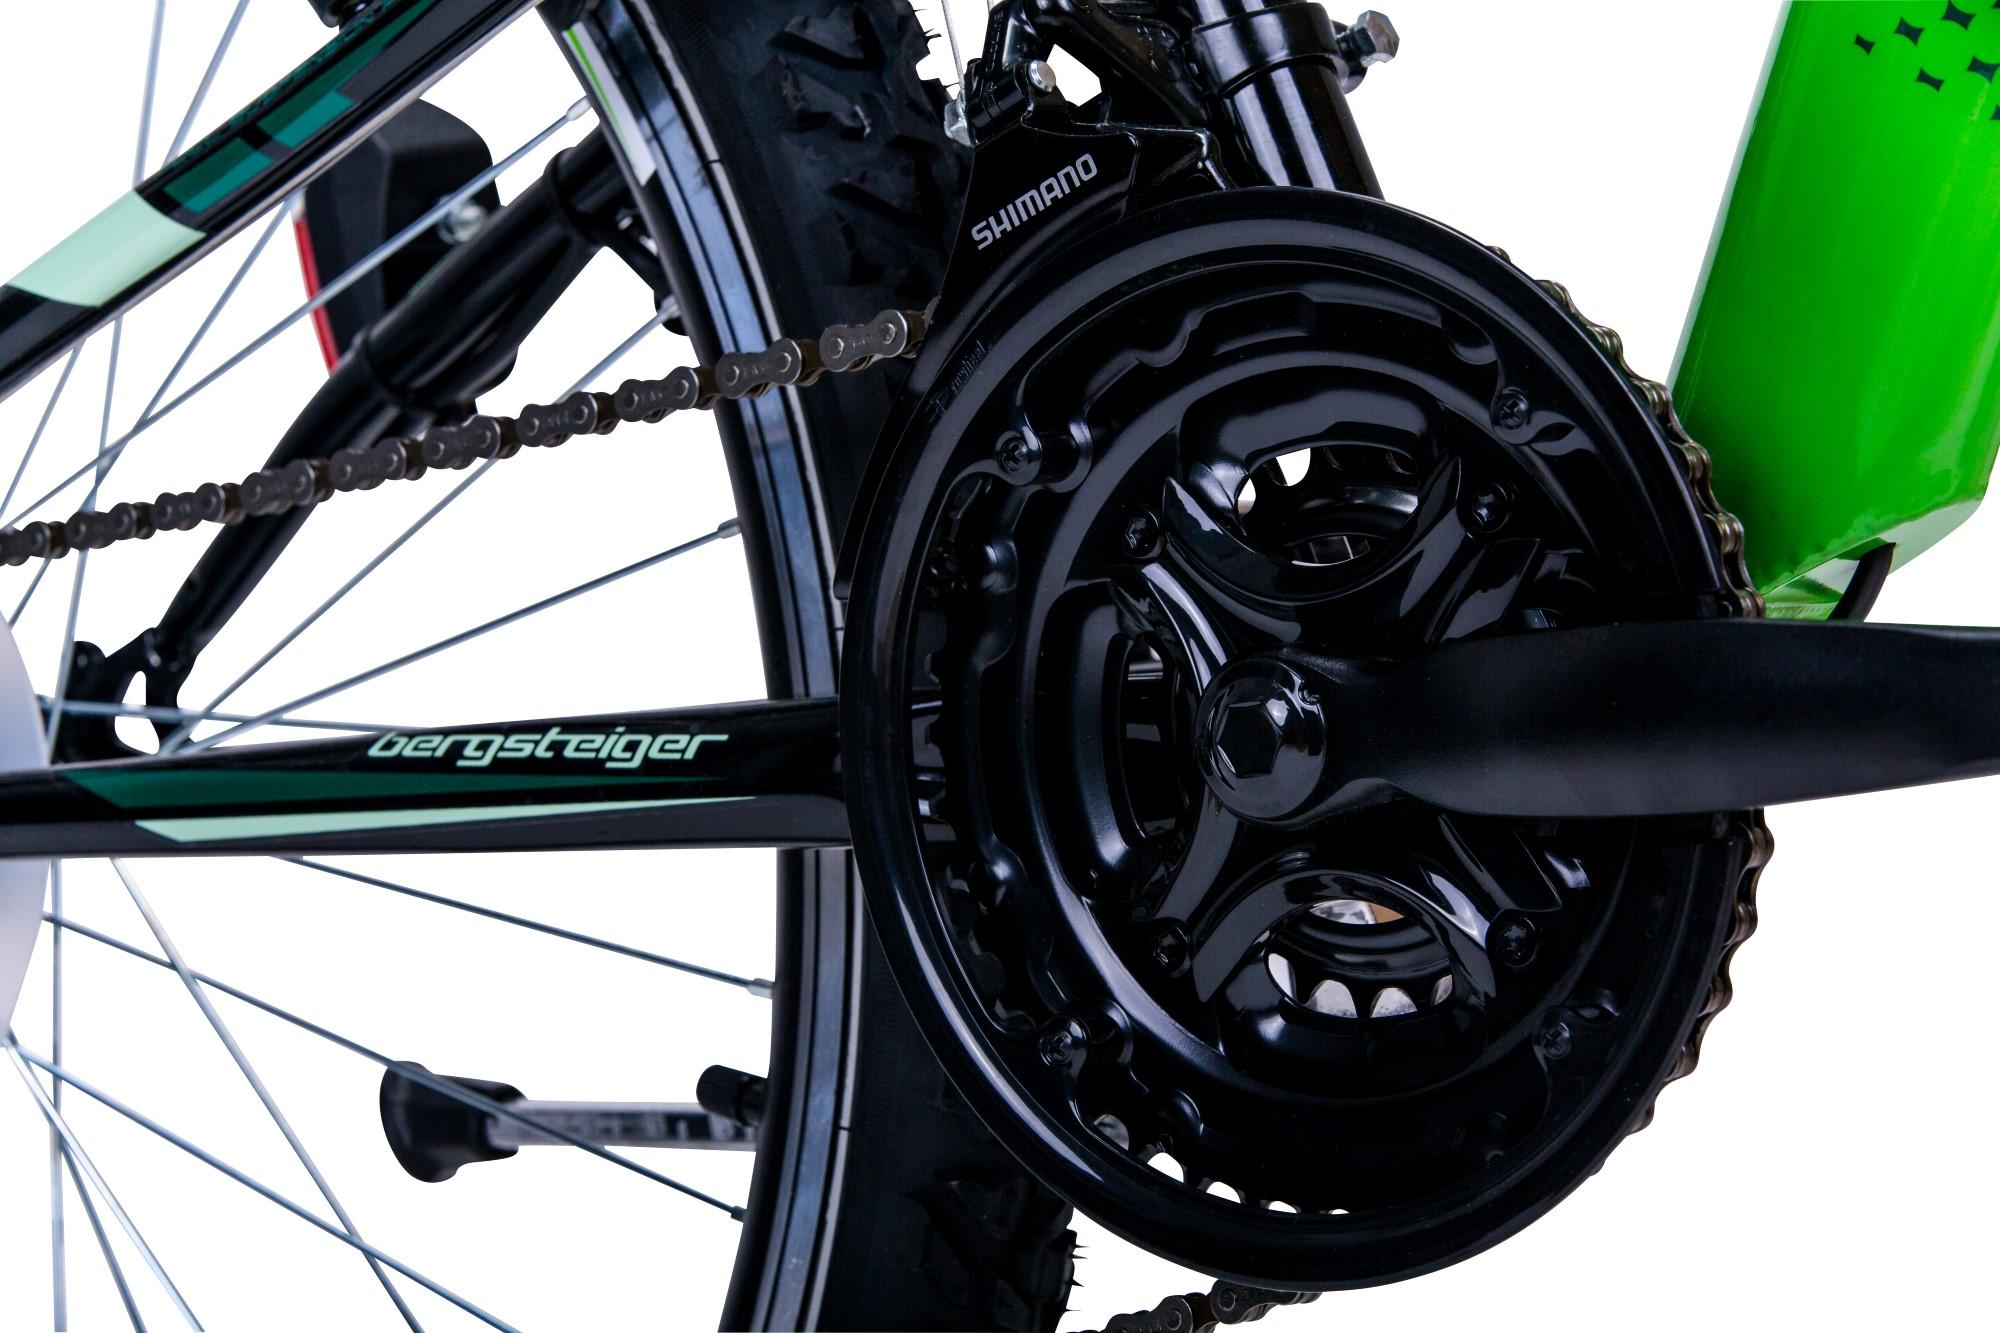 26″ Mountainbike Memphis – Bergsteiger Fahrräder   Mountainbikes ...